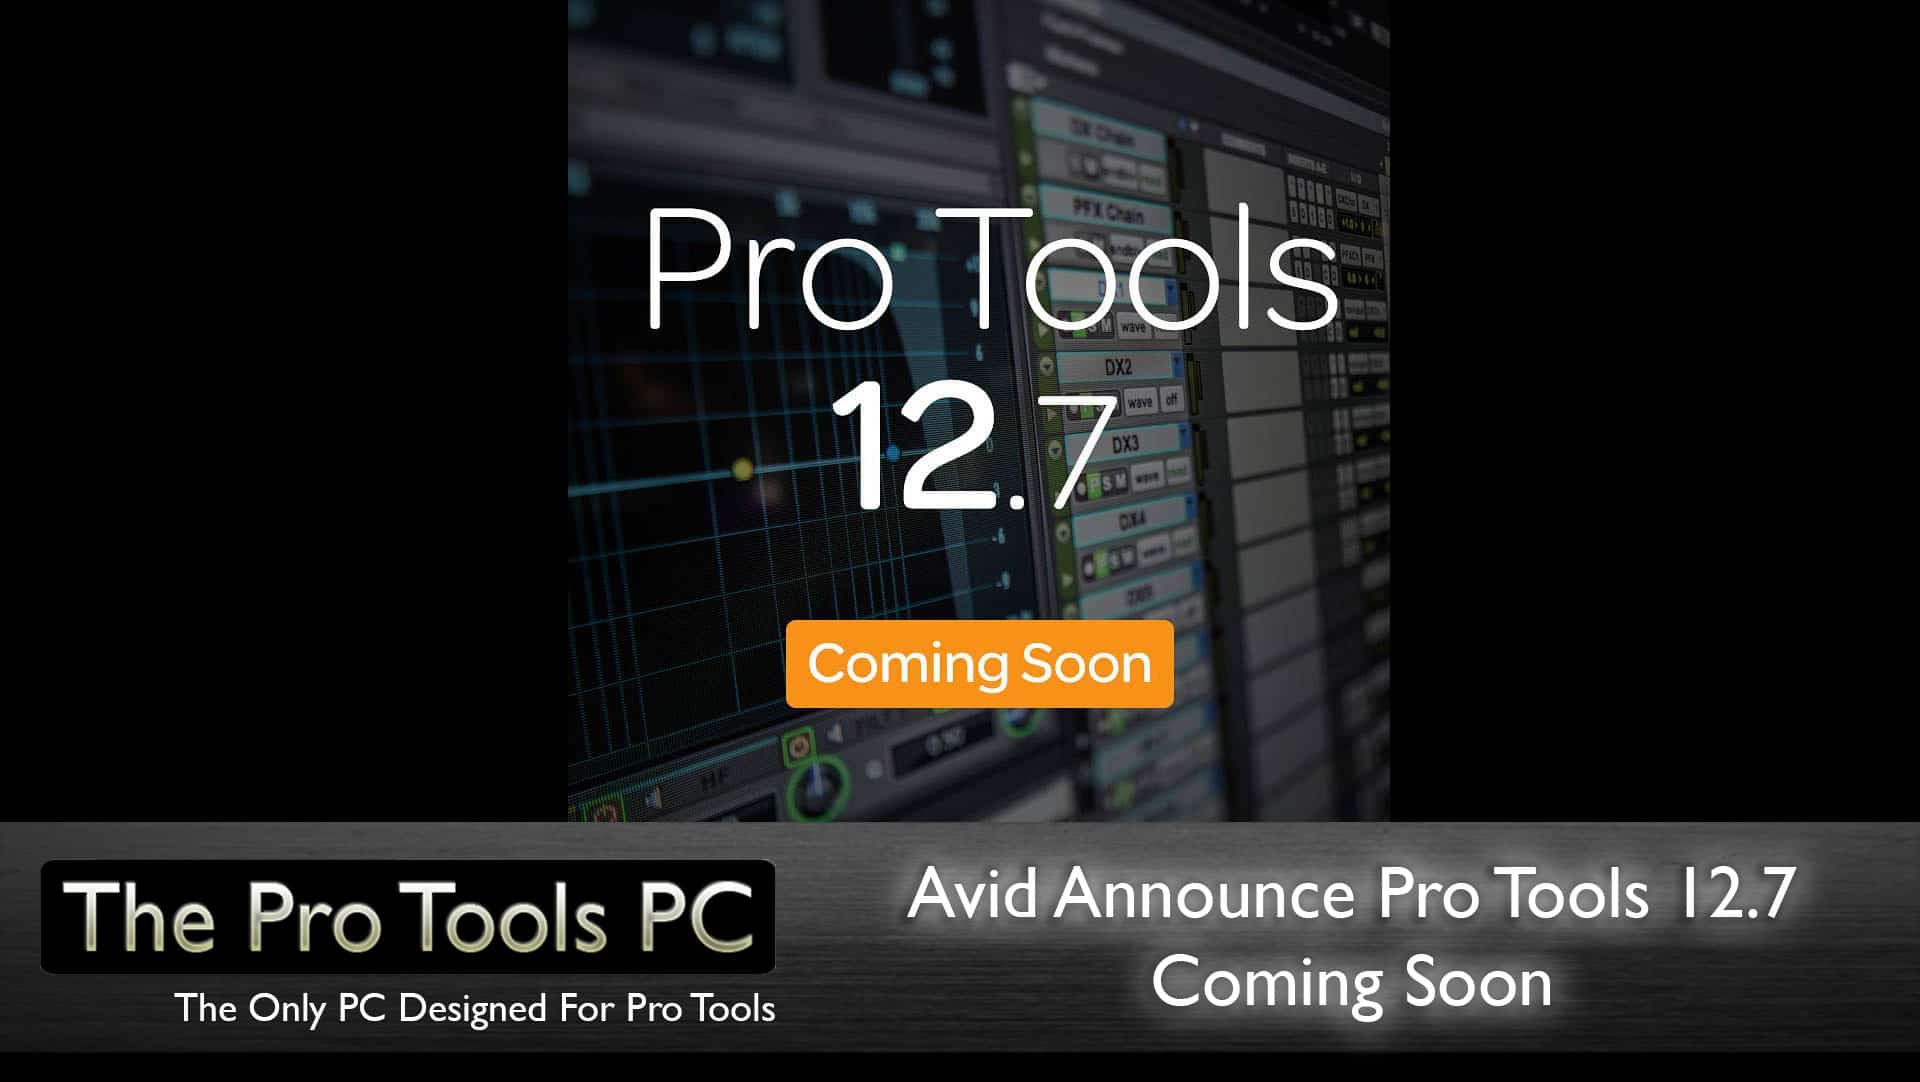 Pro Tools 12.7